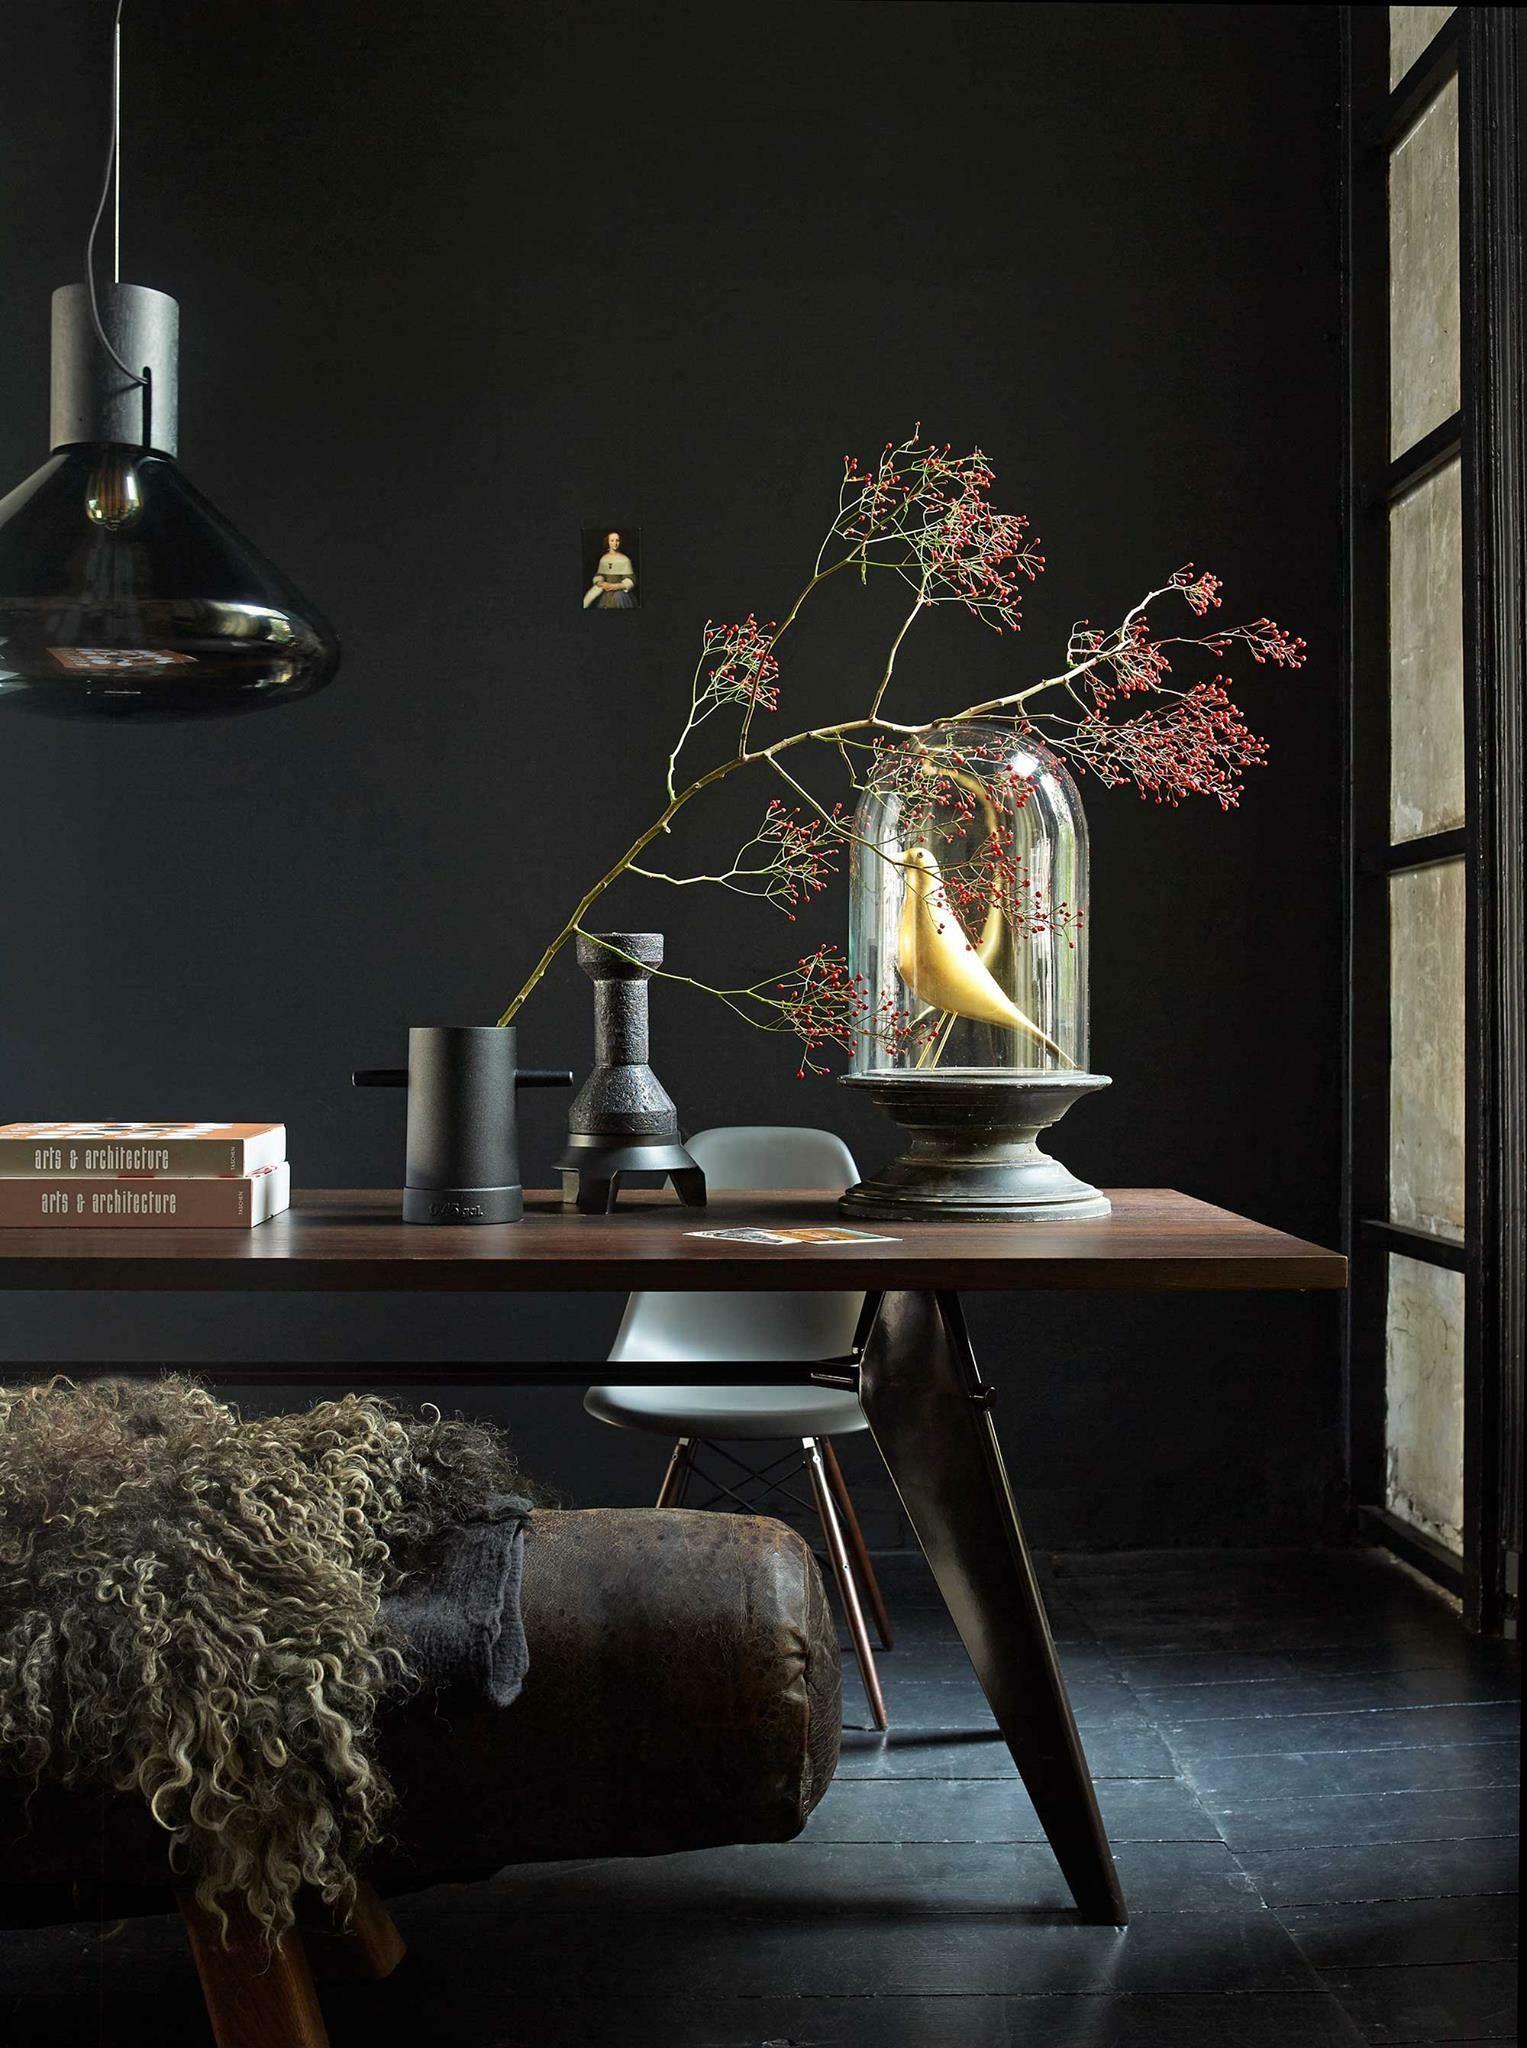 D life home interiors an inspiring black apartment in kiev  dn  pinterest  interiors